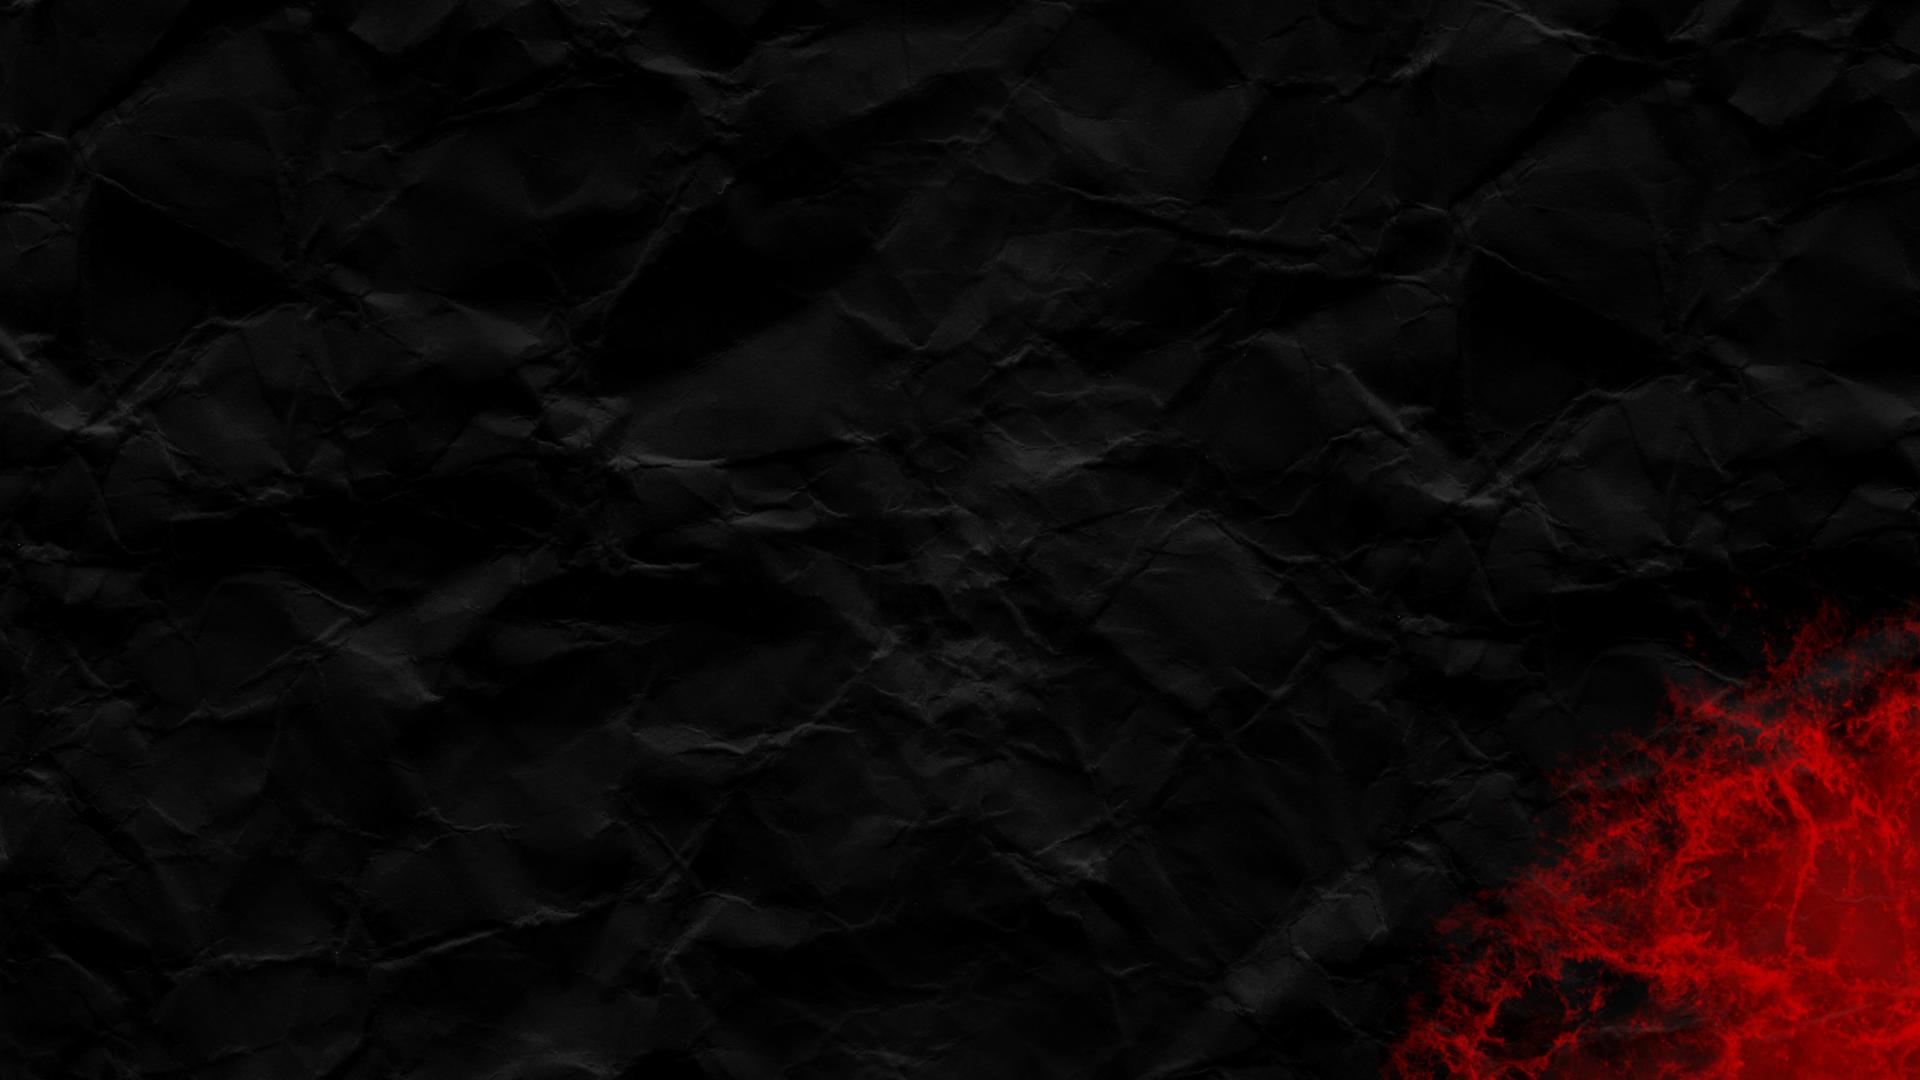 Wallpaper : digital art, simple background, red, artwork ...